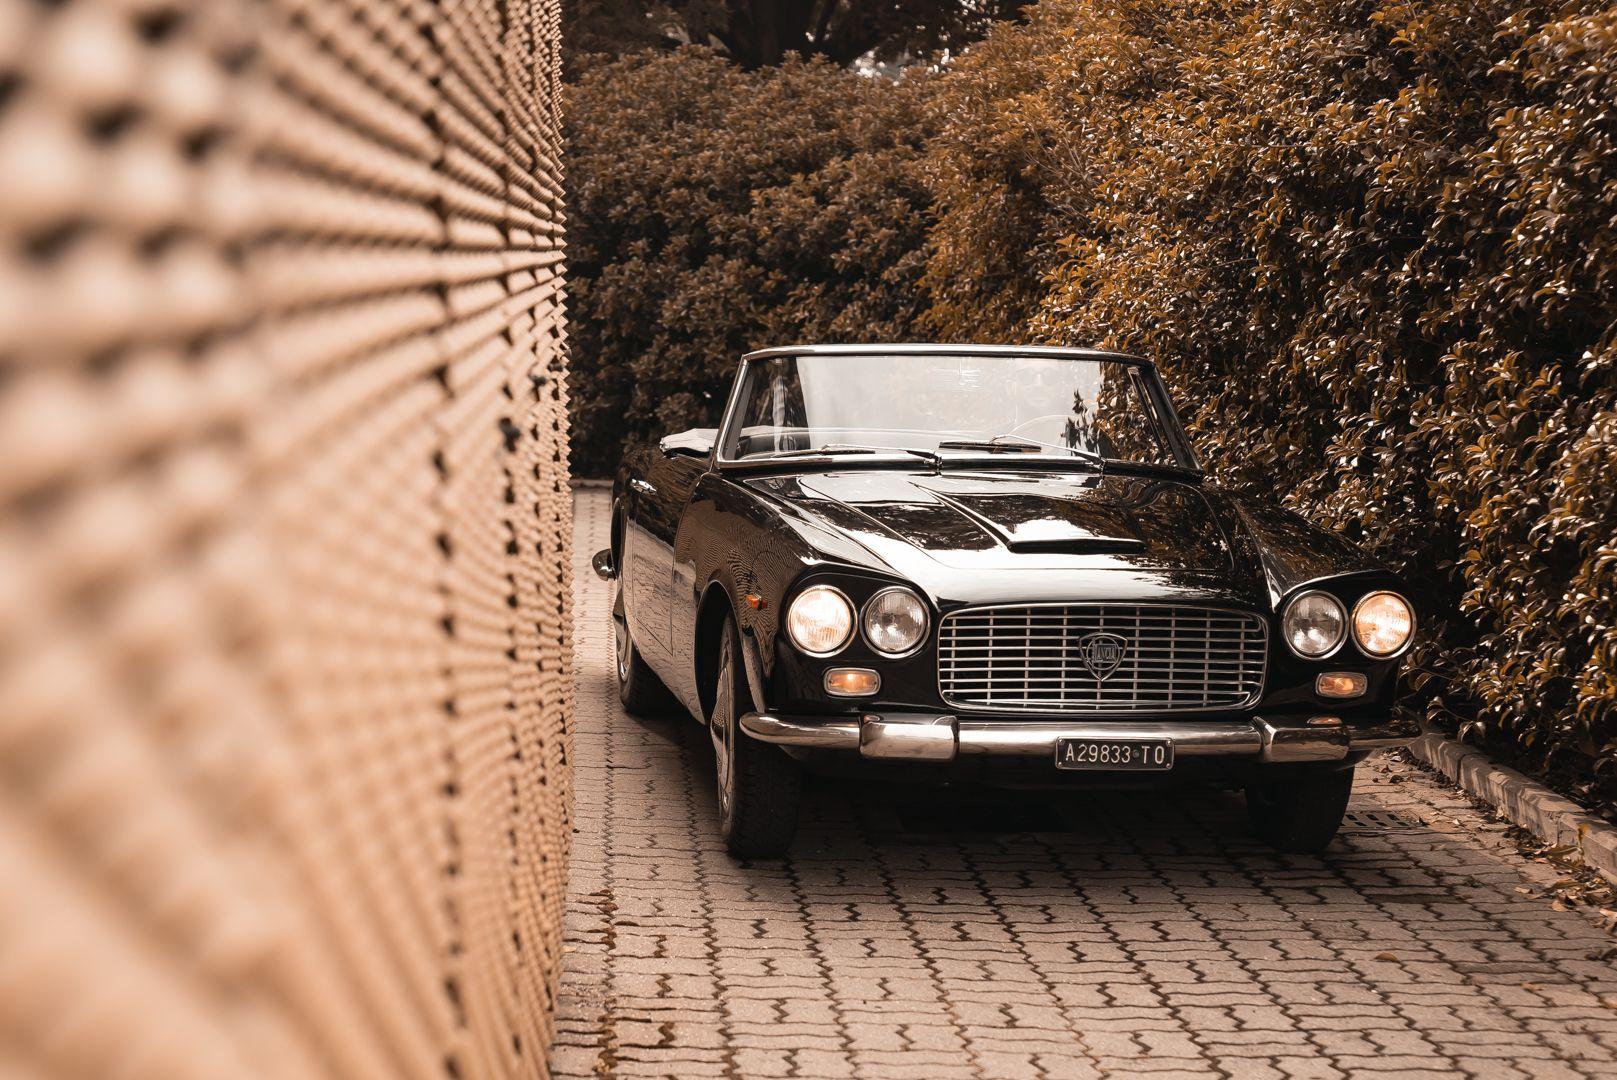 1968 Lancia Flaminia Touring Convertible 2800 3C 79176